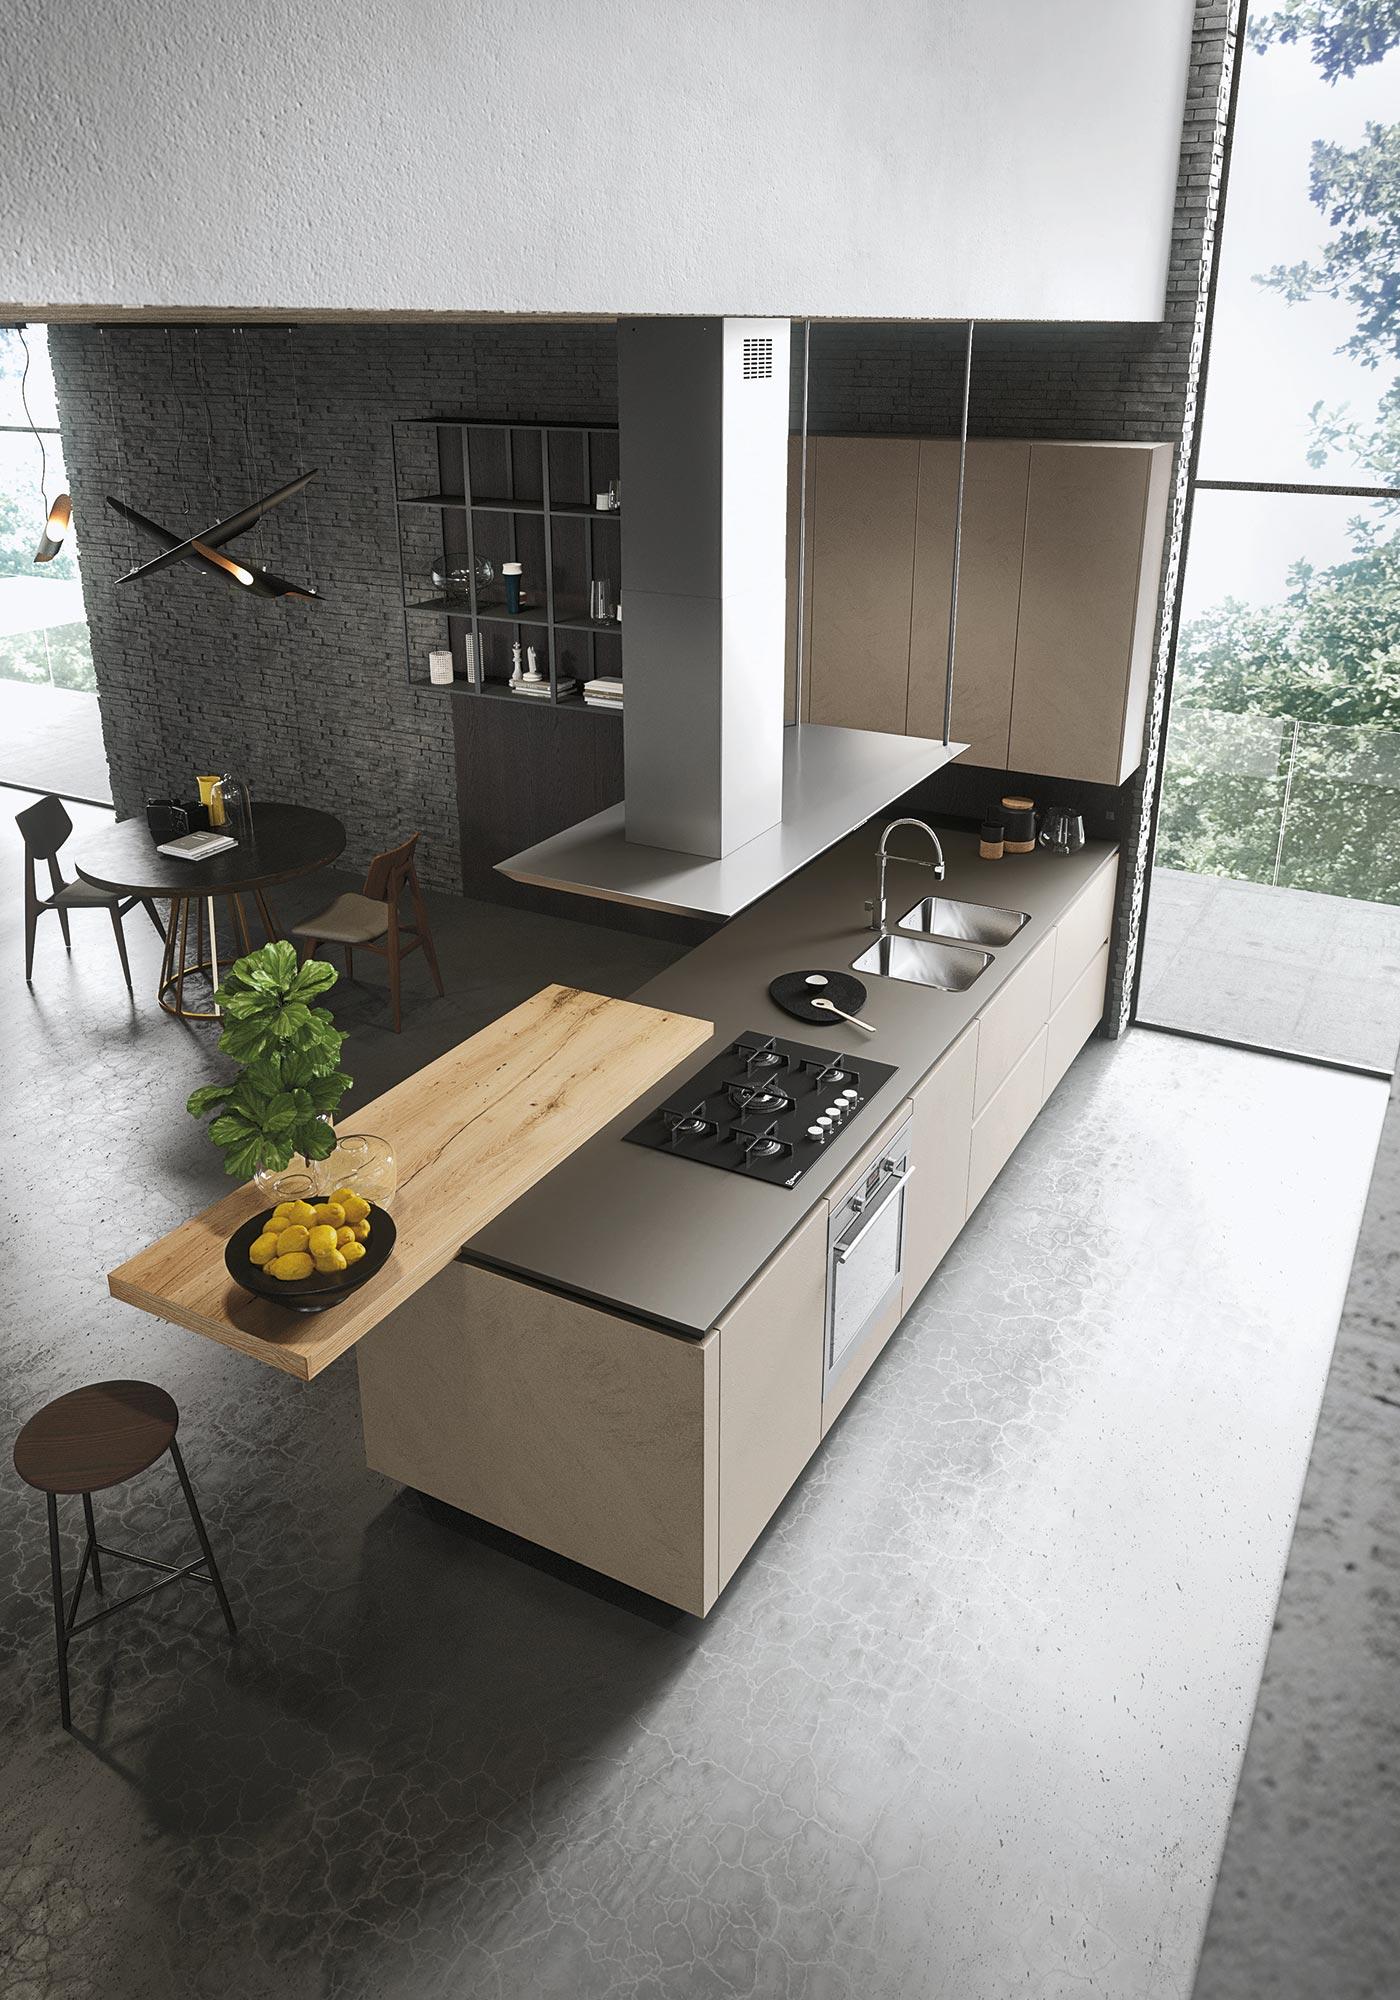 cucine-componibili-moderne-look-snaidero-5